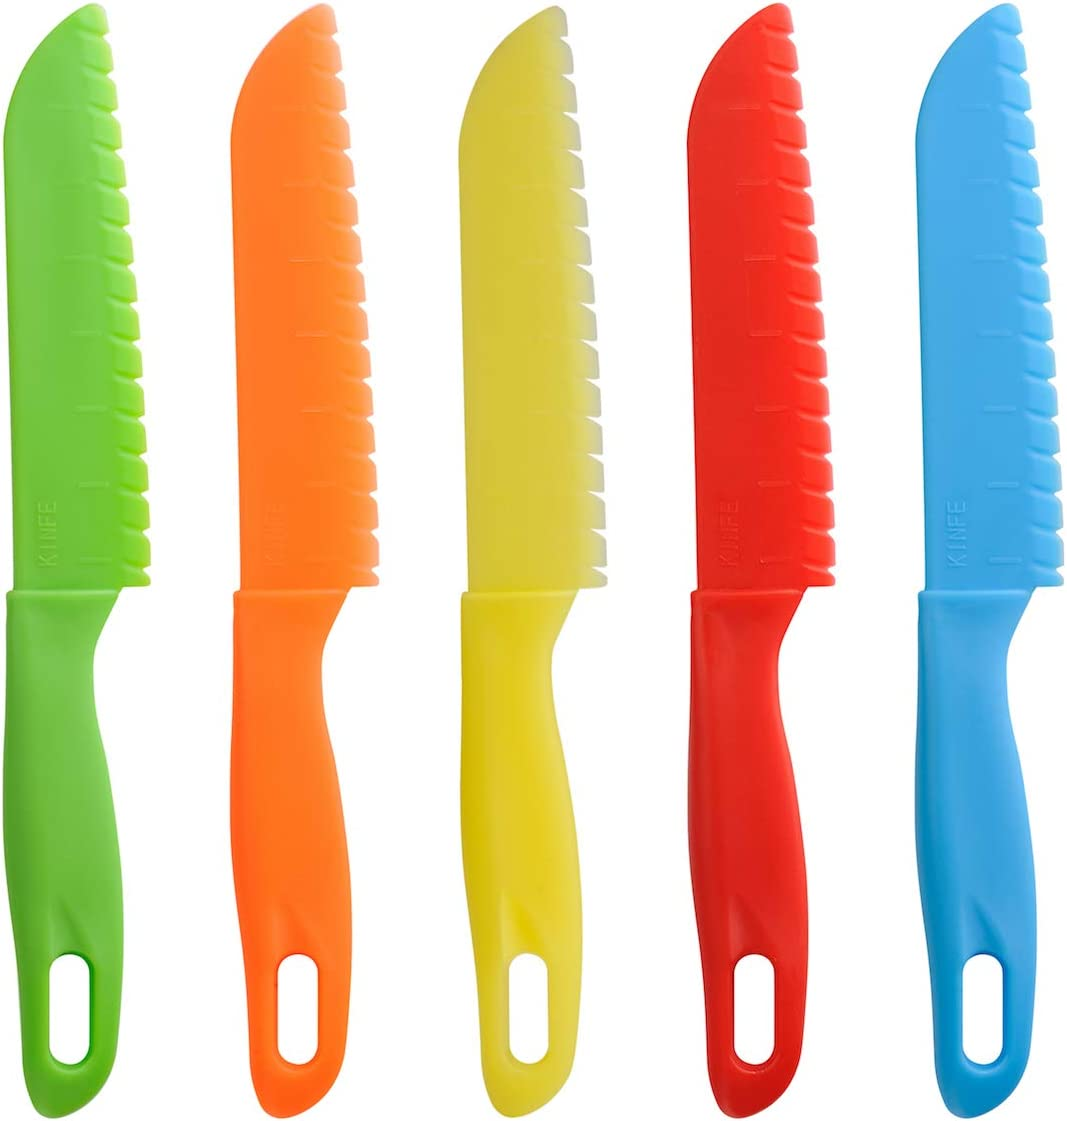 5 cuchillos de cocina para niños de ONUPGO, juego de cuchillos de cocina de plástico para niños, cuchillos de cocina seguros para niños, cuchillos de nailon para chef